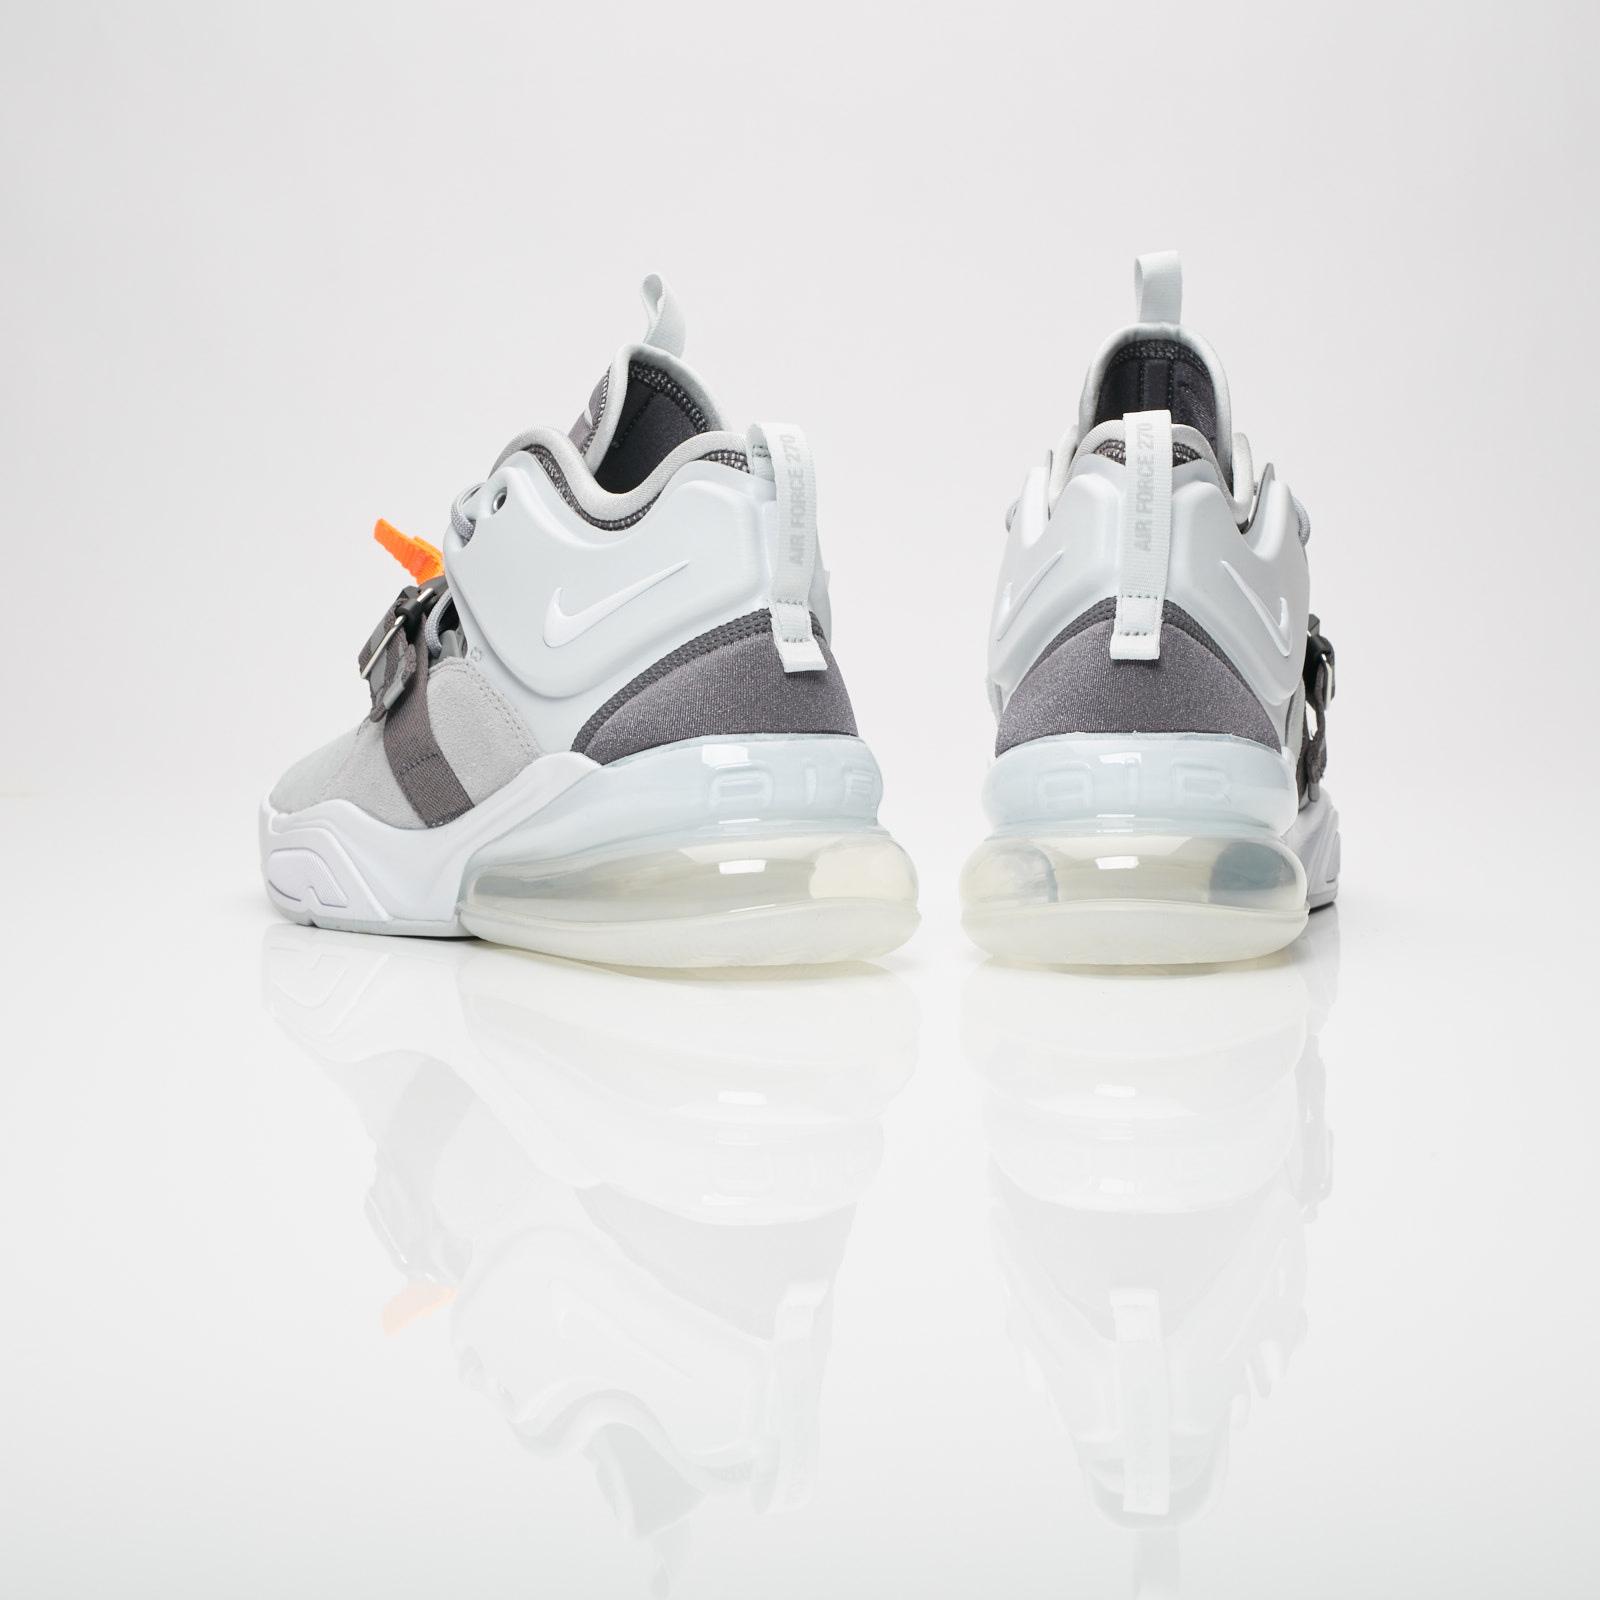 Most Popular Nike Air Force 270 Wolf Grey Dark Grey AH6772 002 Men's Casual Shoes AH6772 002